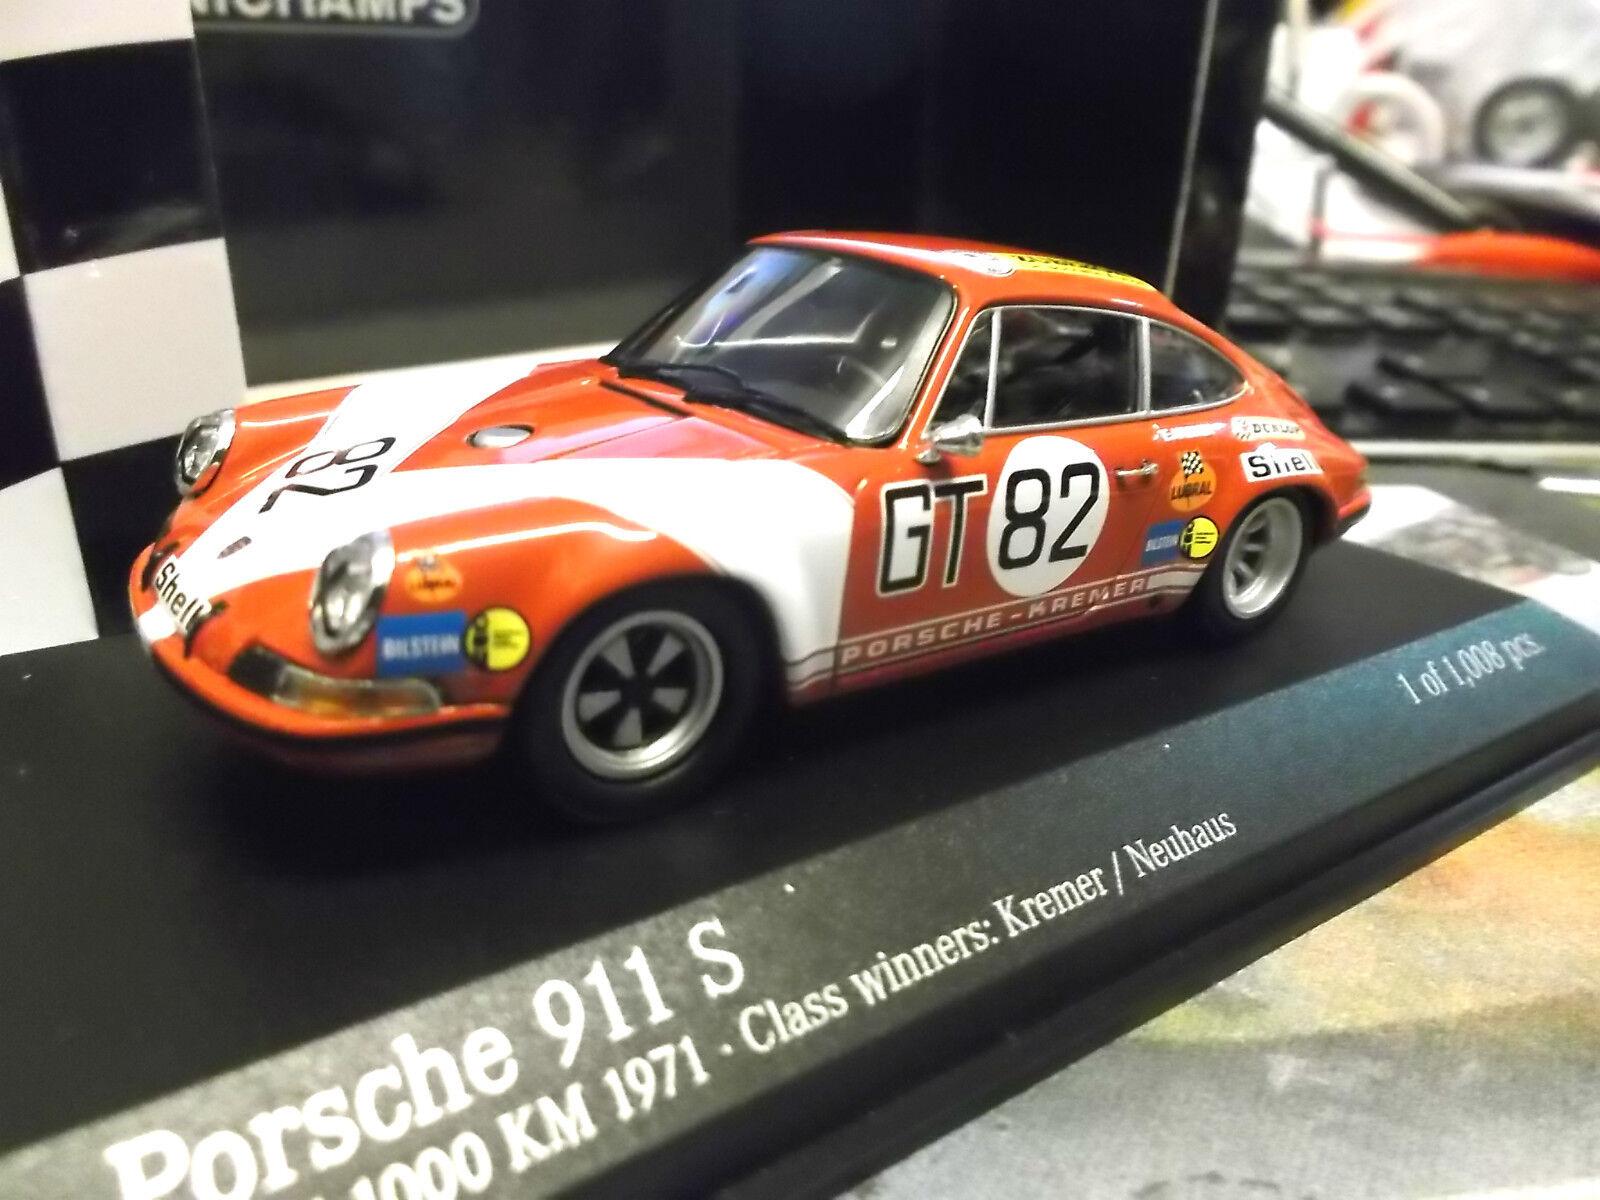 PORSCHE 911 S RACING 1000km  82 NURBURGRING Neuhaus Kremer 1971 Minichamps 1:43